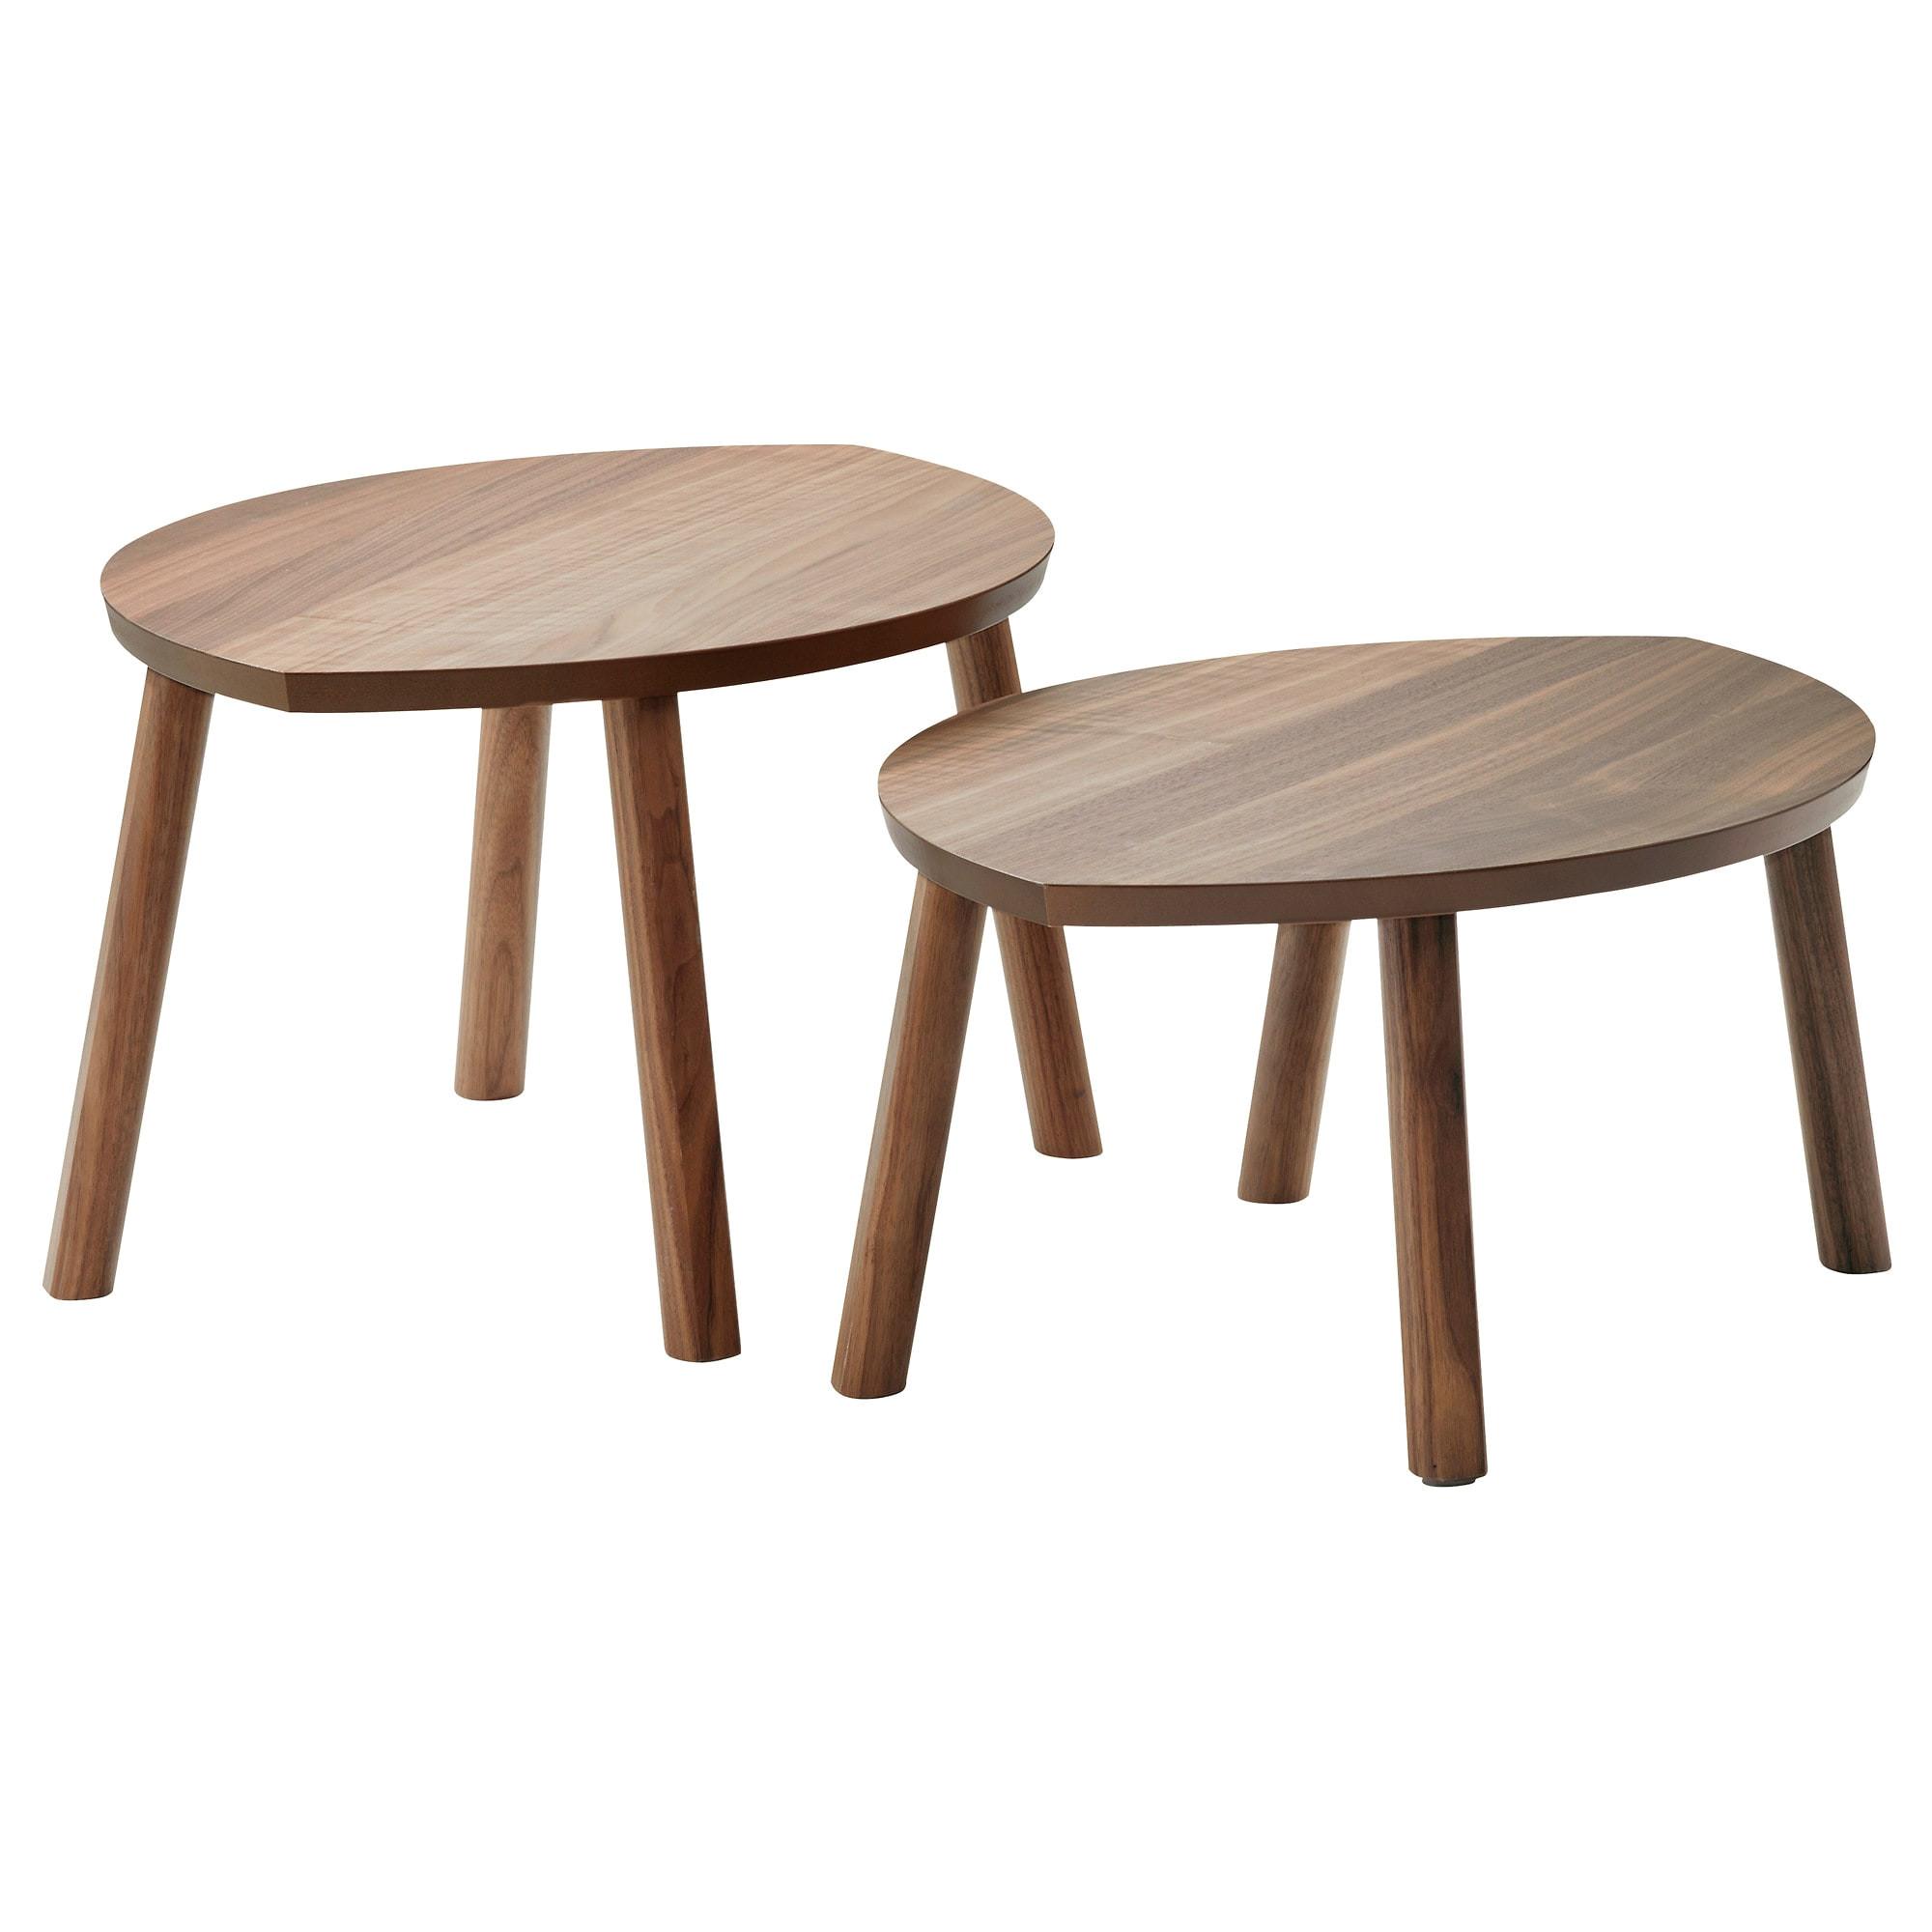 ikea stockholm nest of tables set of 2